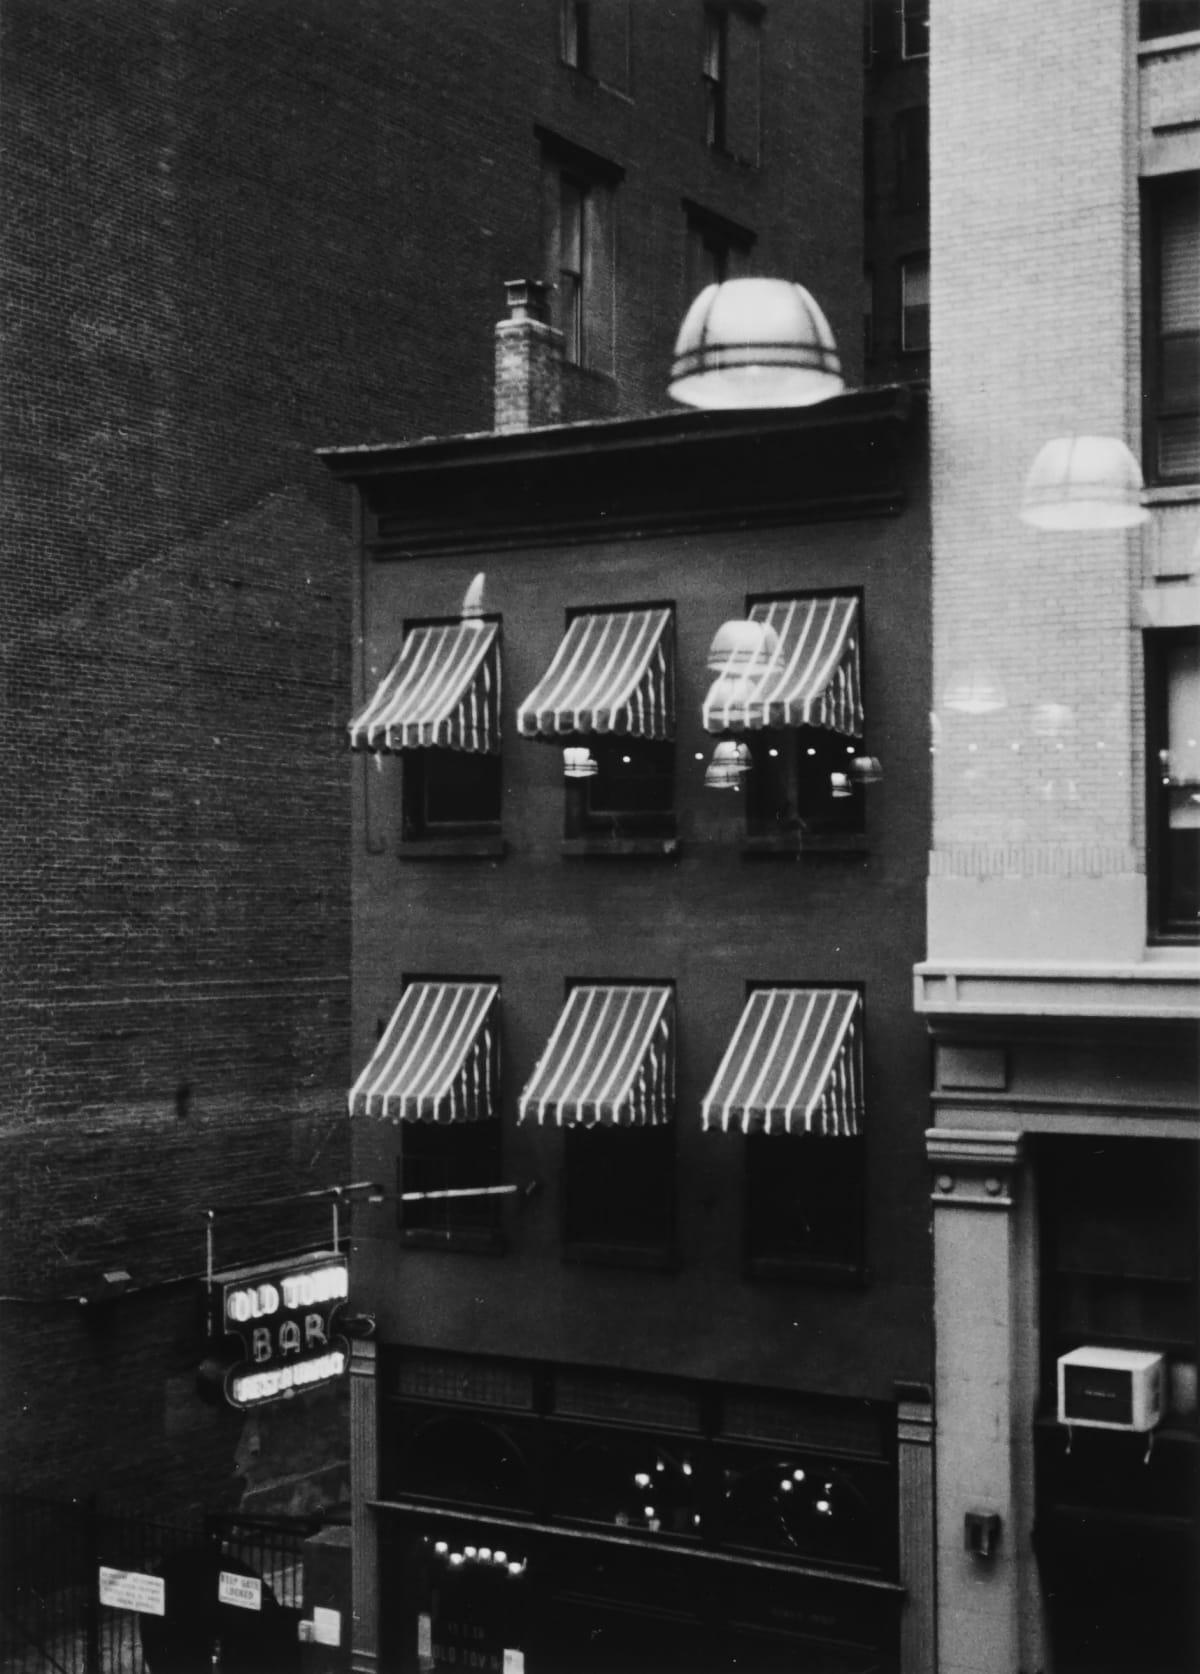 "Ernesto Esquer 18th Street, Manhattan, 2018, printed 2019 Gelatin Silver print Image 5.5 x 4"", paper 8 x 10"", mat 11 x 14"" 1/20"